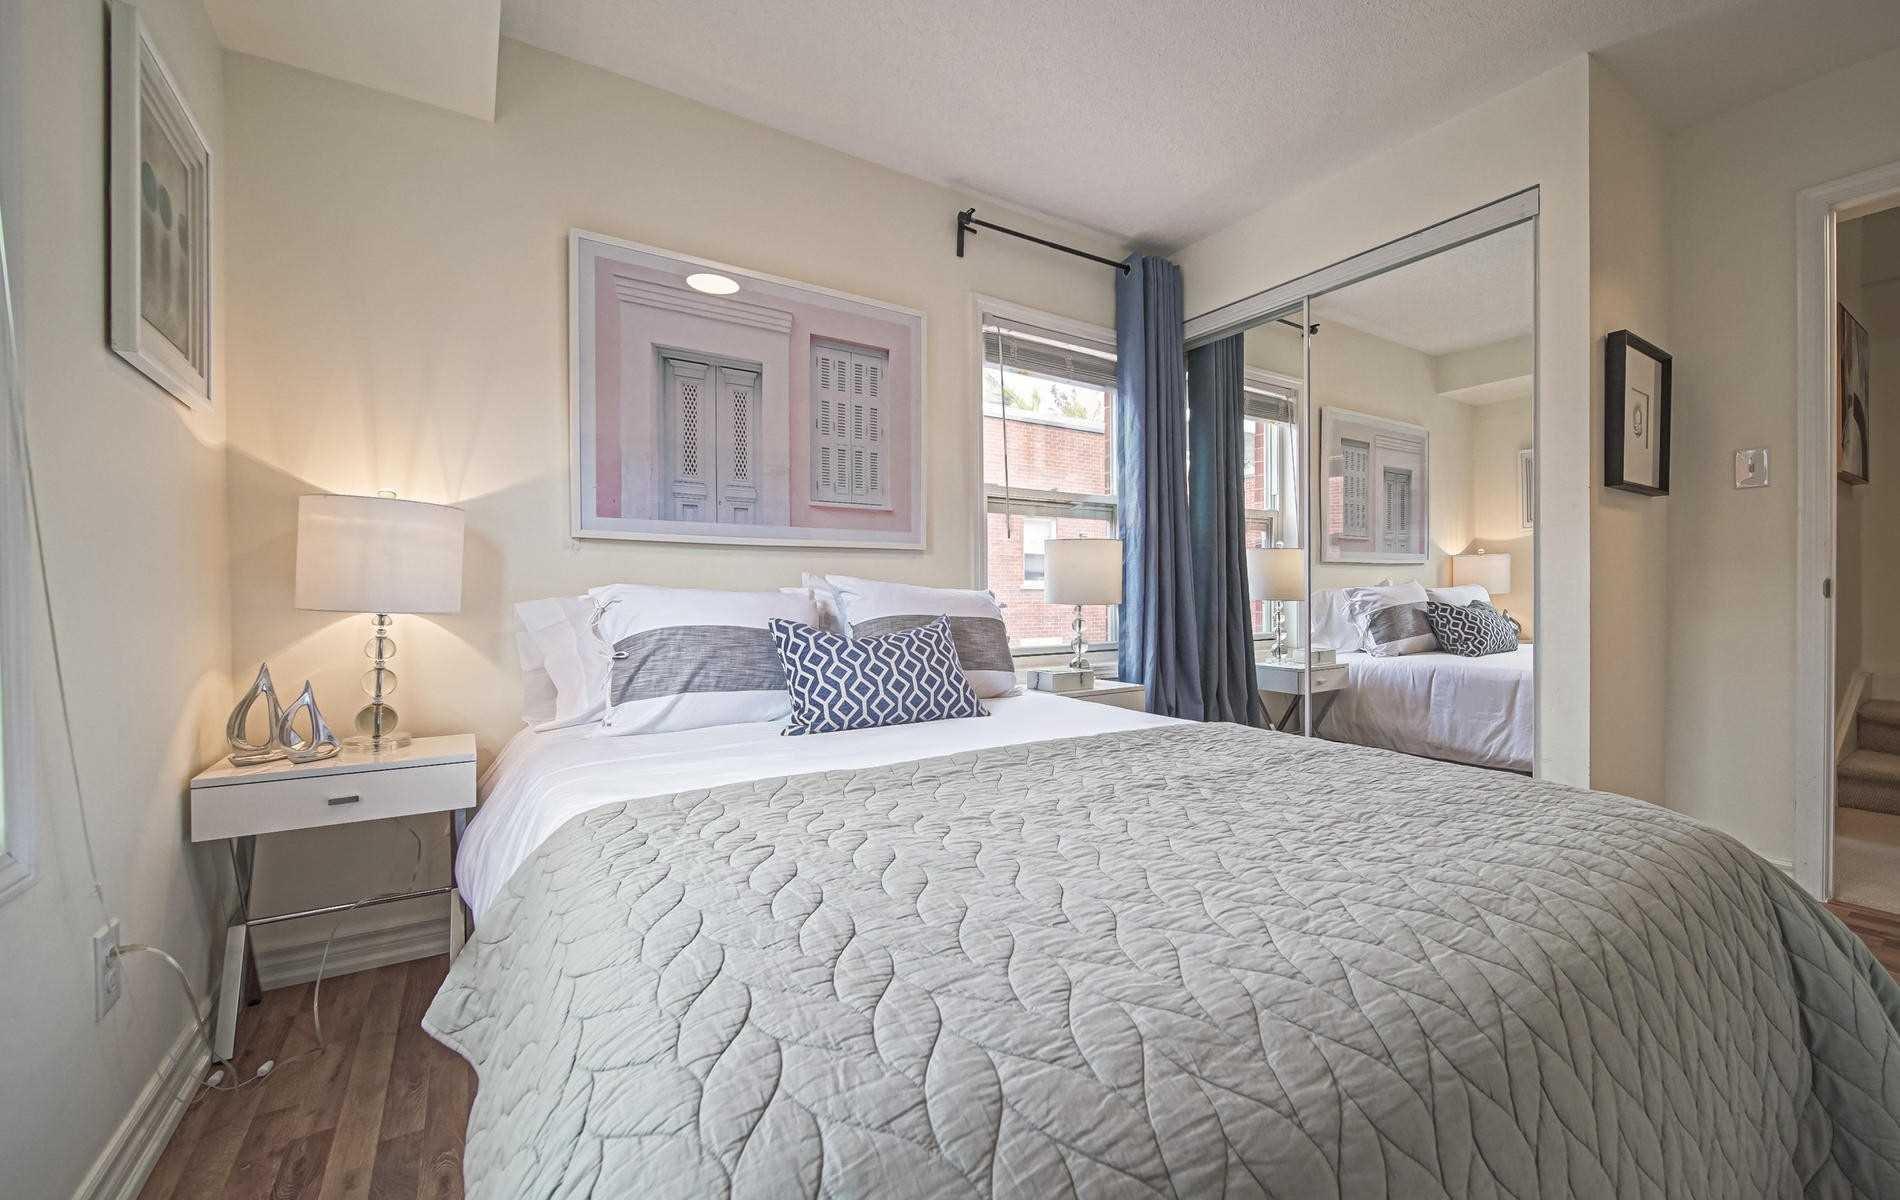 Photo 12: Photos: 3 78 Munro Street in Toronto: South Riverdale Condo for sale (Toronto E01)  : MLS®# E4615987